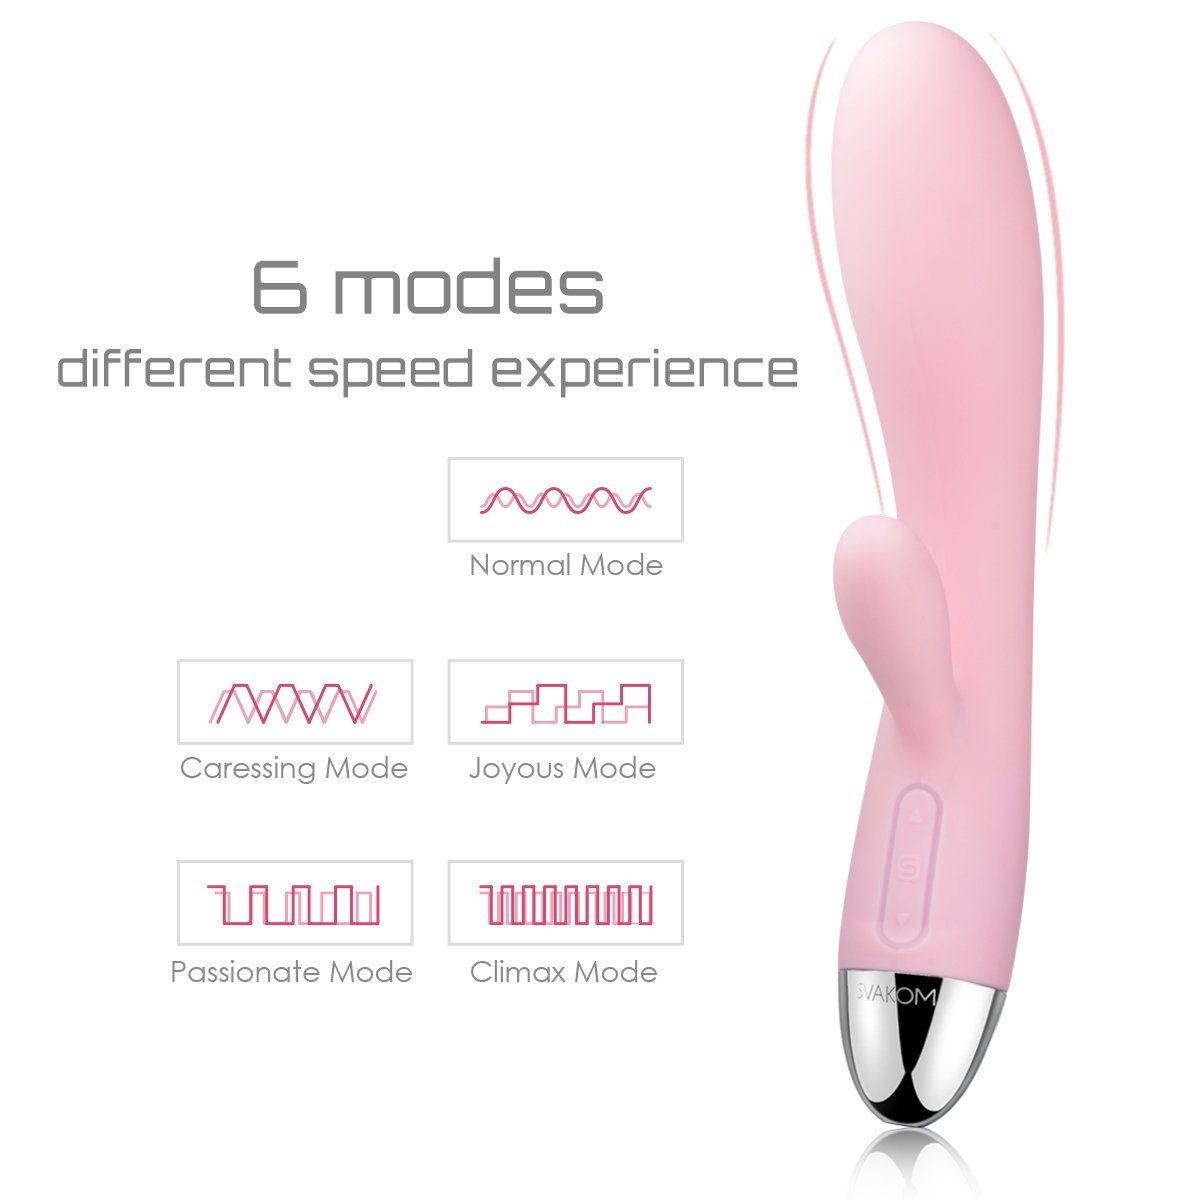 SVAKOM Cherry Rechargeable 100% Waterproof Rabbit G-spot Clitoral Vibrators with 6 vibration Modes Stimulators Dildos Wand Massagers for Women